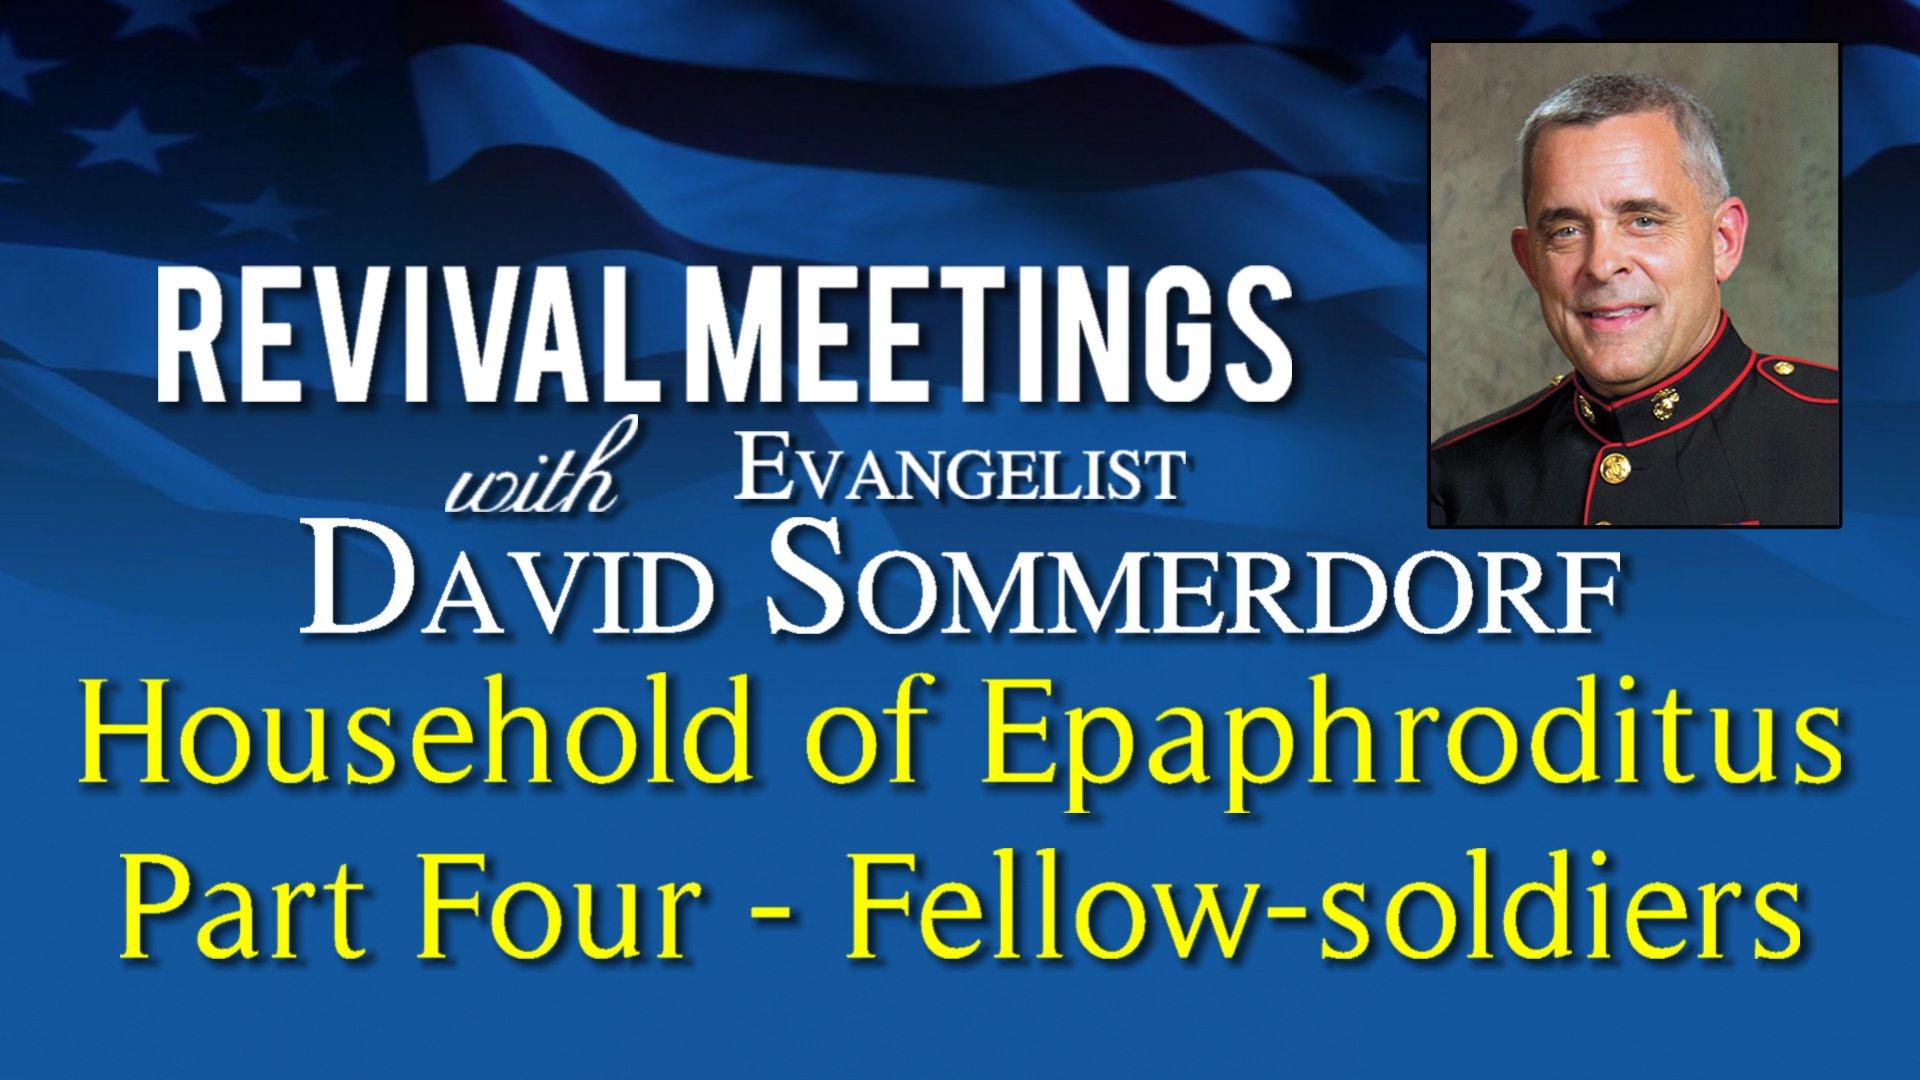 Household of Epaphroditus – Part 4 Fellow Soldier